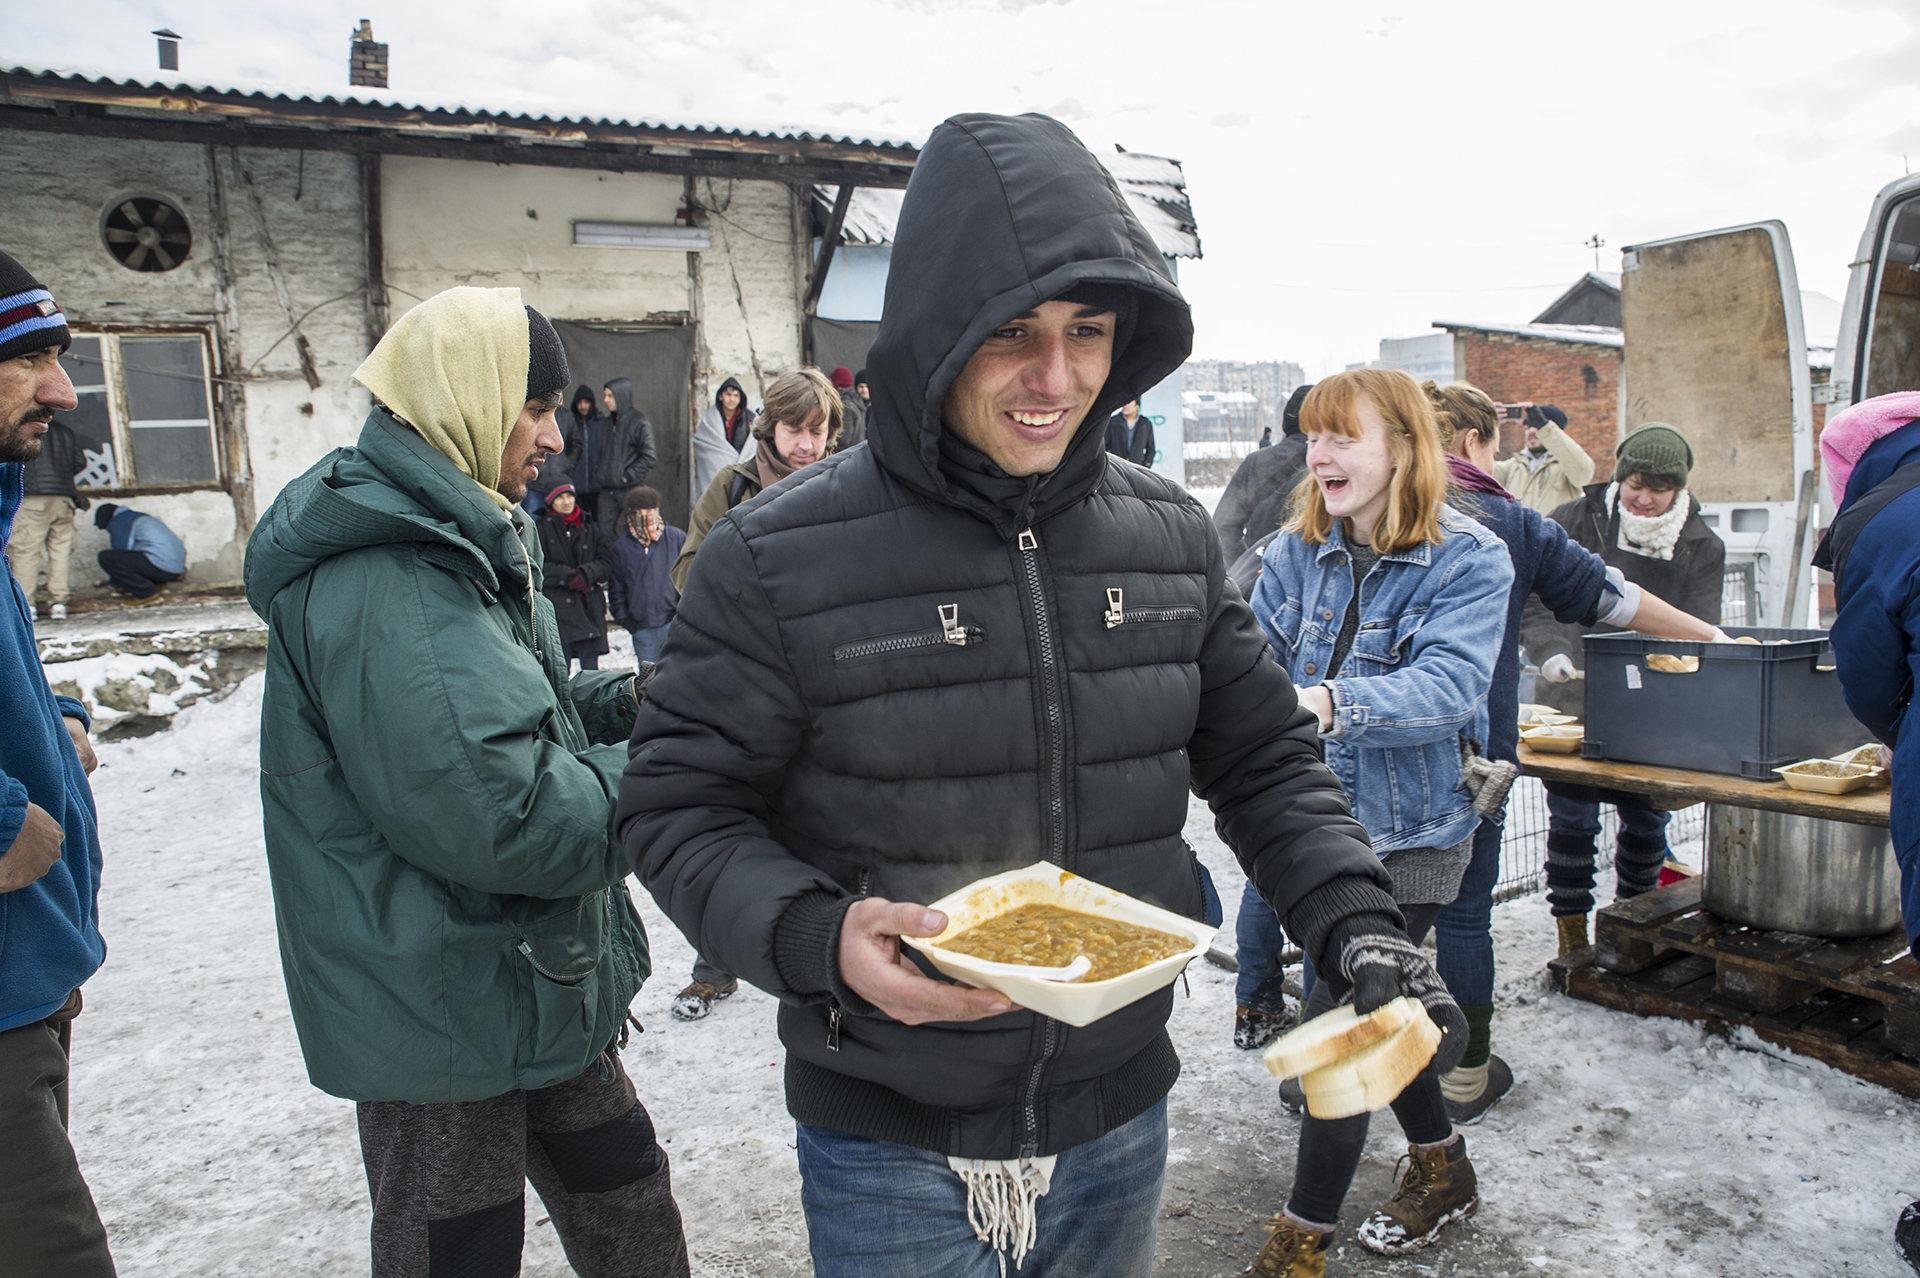 Flüchtlinge bei der Essensausgabe (Foto: Josep Vecino/picture-alliance/AA)